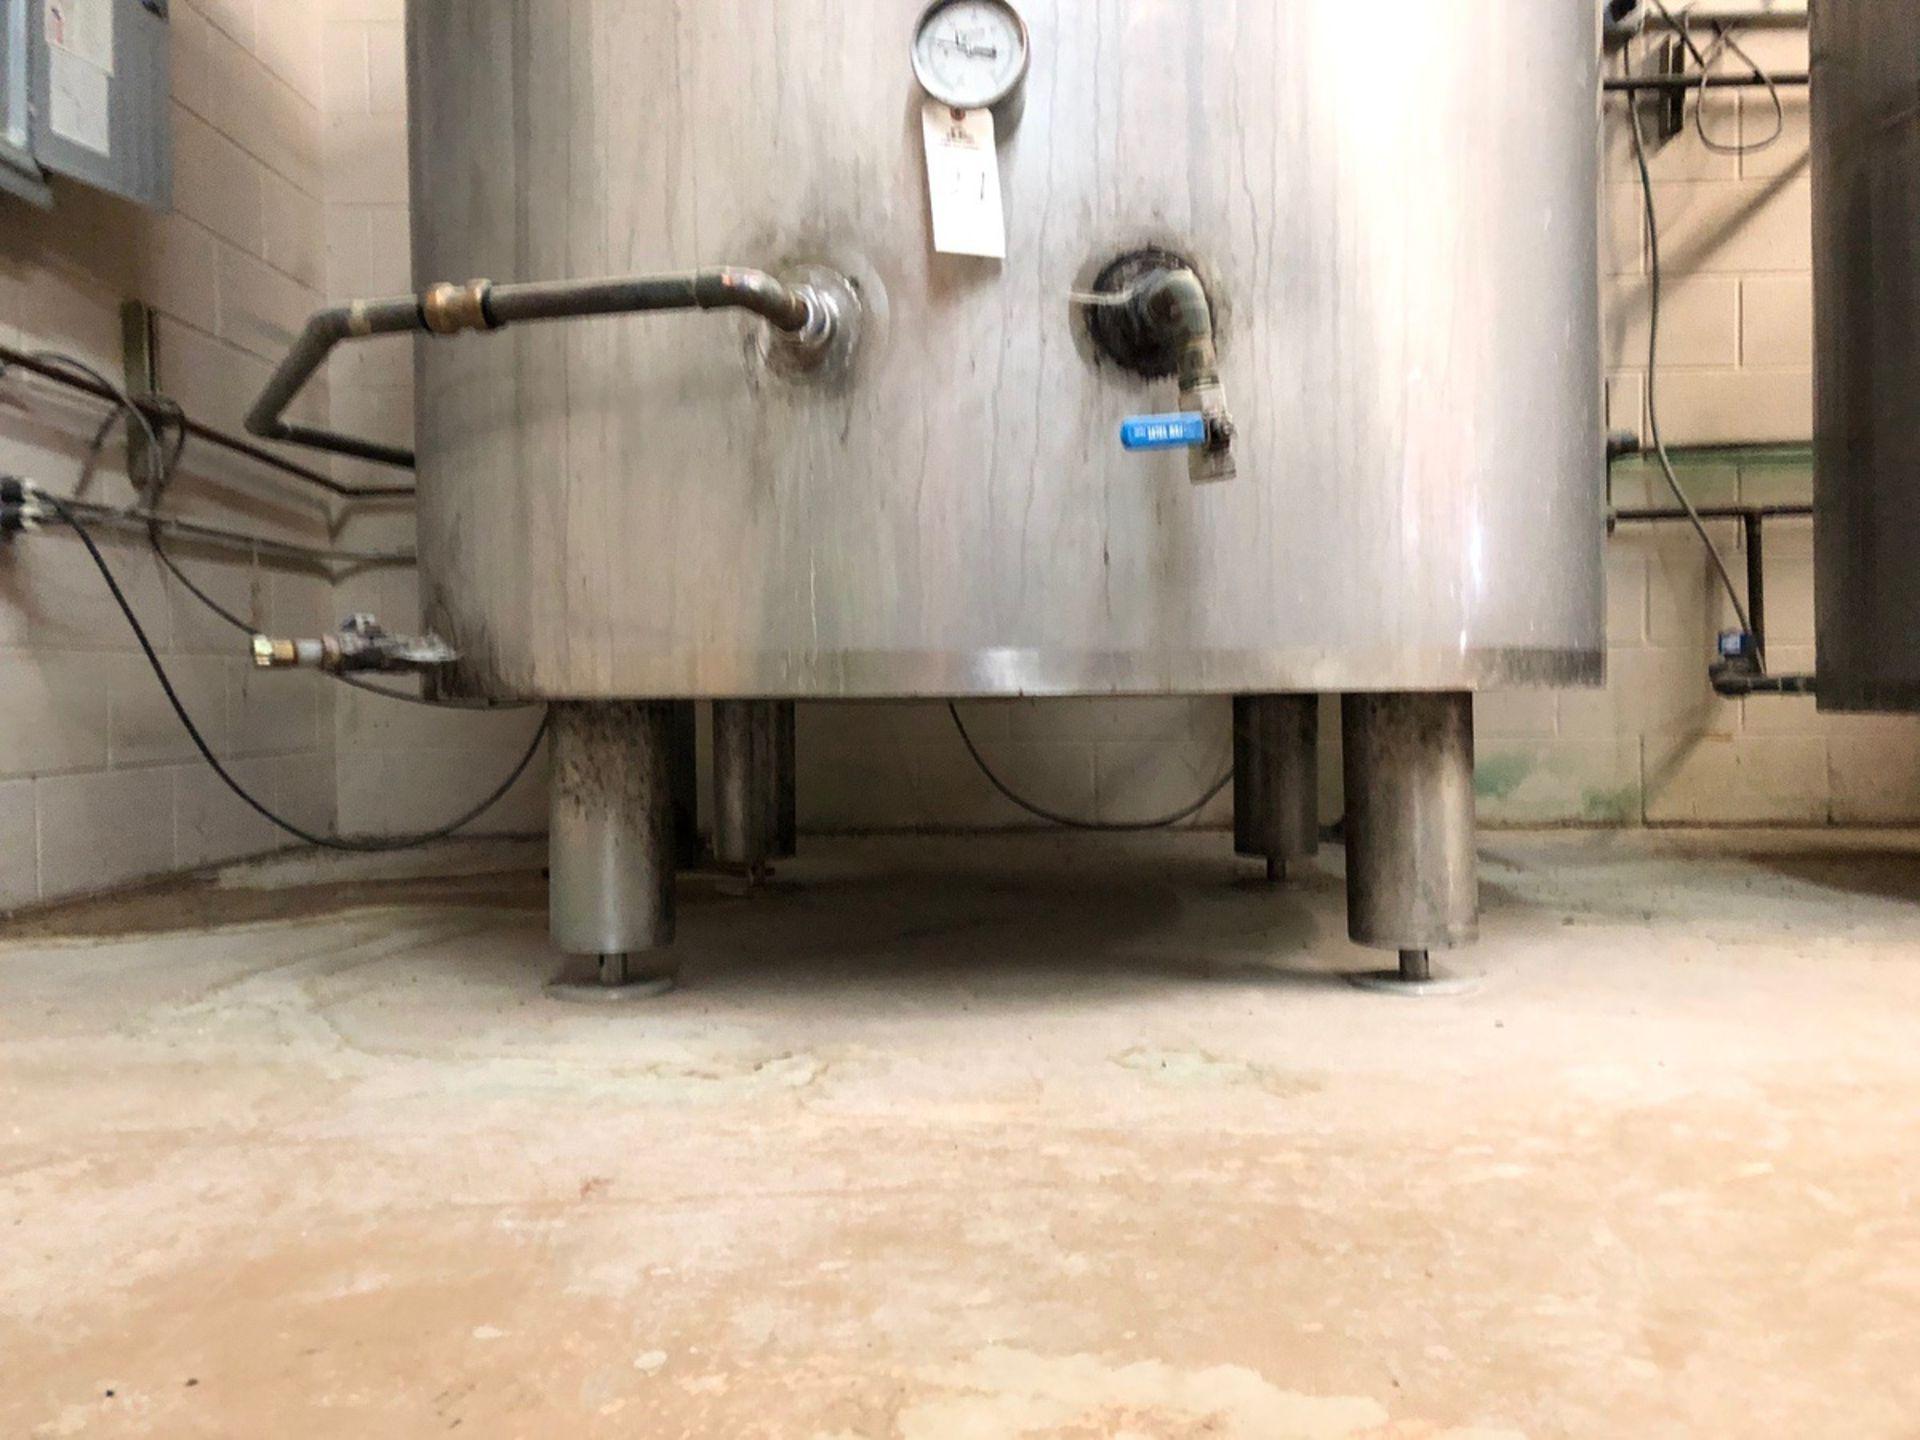 Lot 27 - 2008 Bavarian 2000L Glycol Storage Tank | Sub to Bulk | Rig Fee: $350